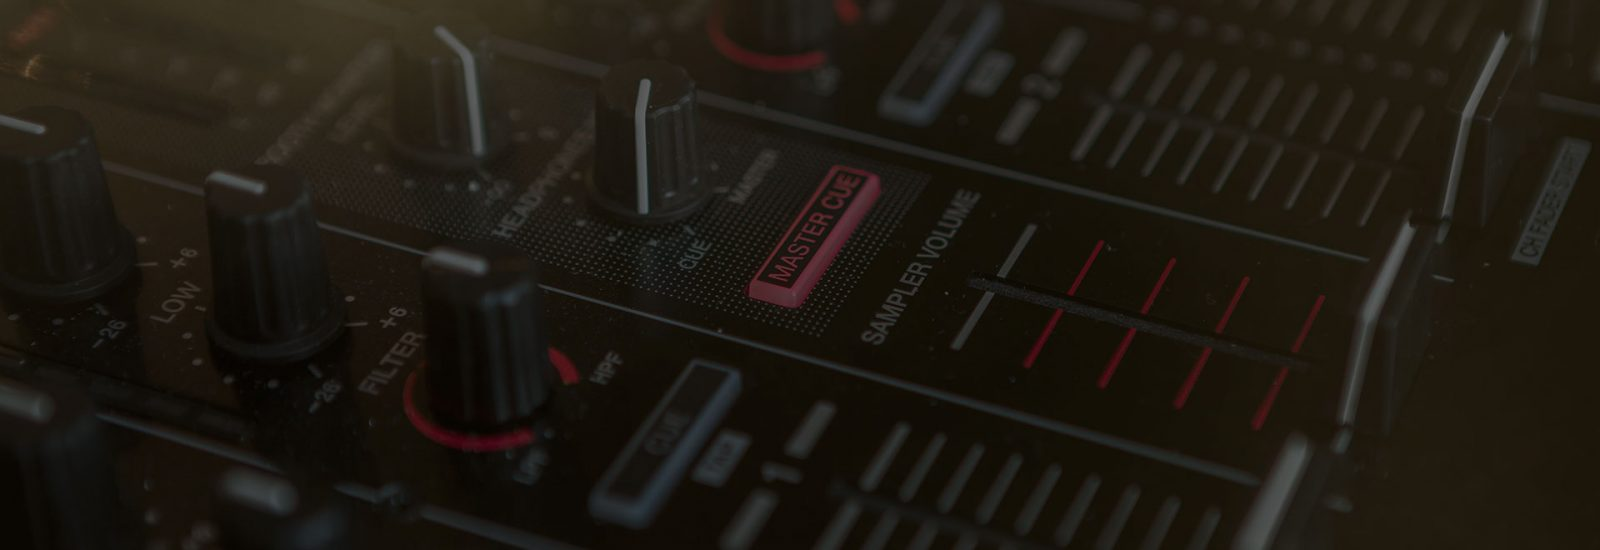 studio-bg_03